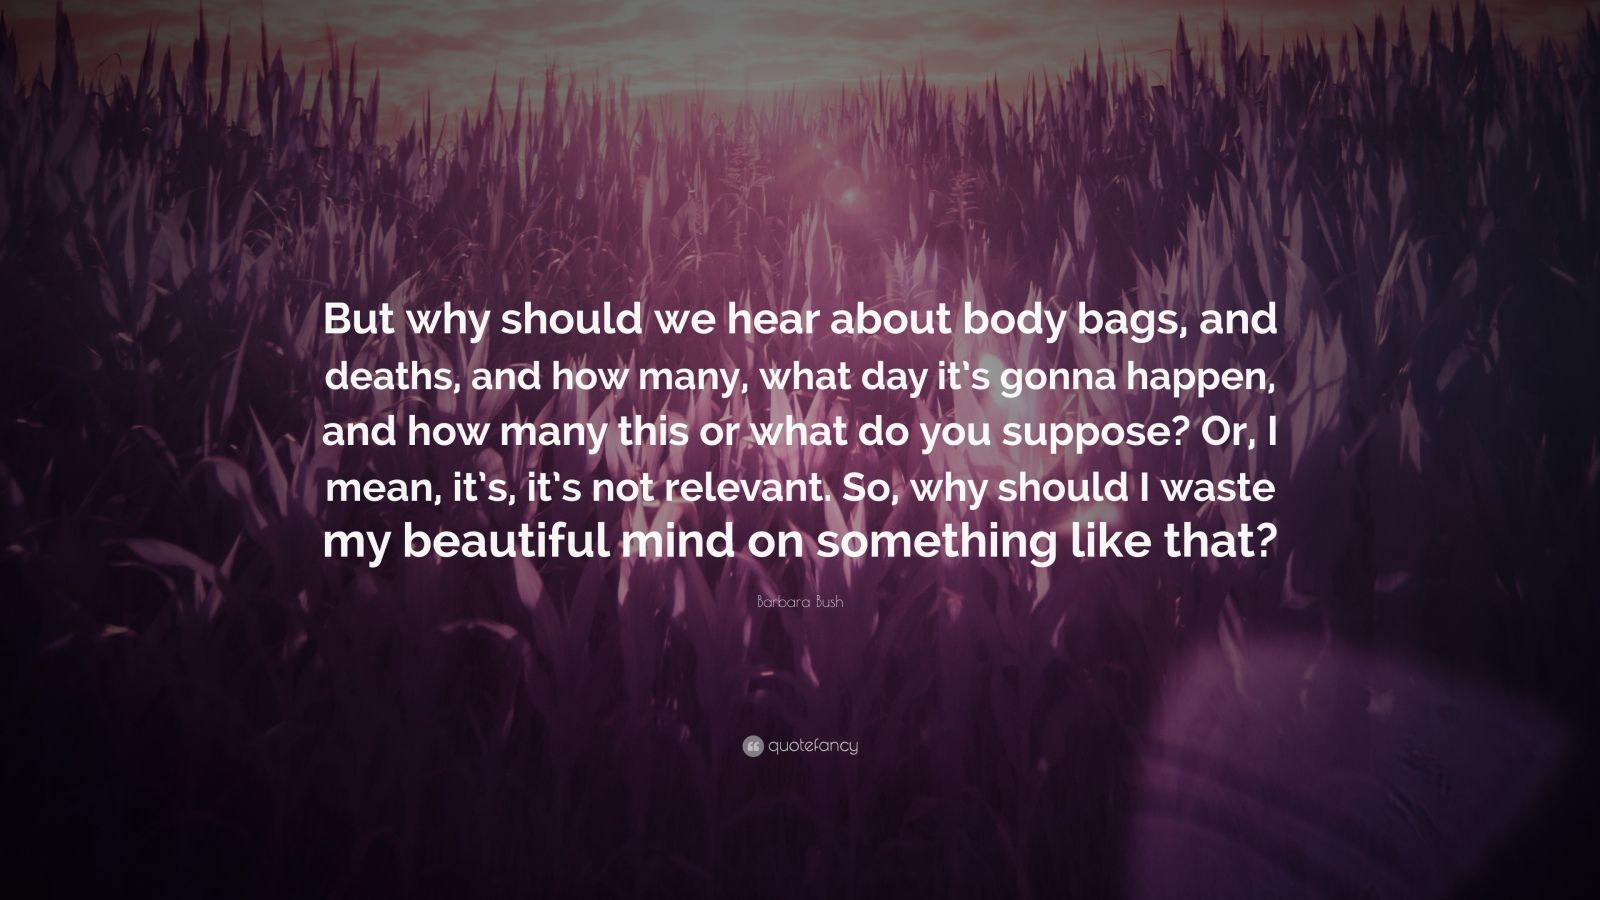 Steve Jobs Motivational Quotes Wallpaper Barbara Bush Quotes 30 Wallpapers Quotefancy